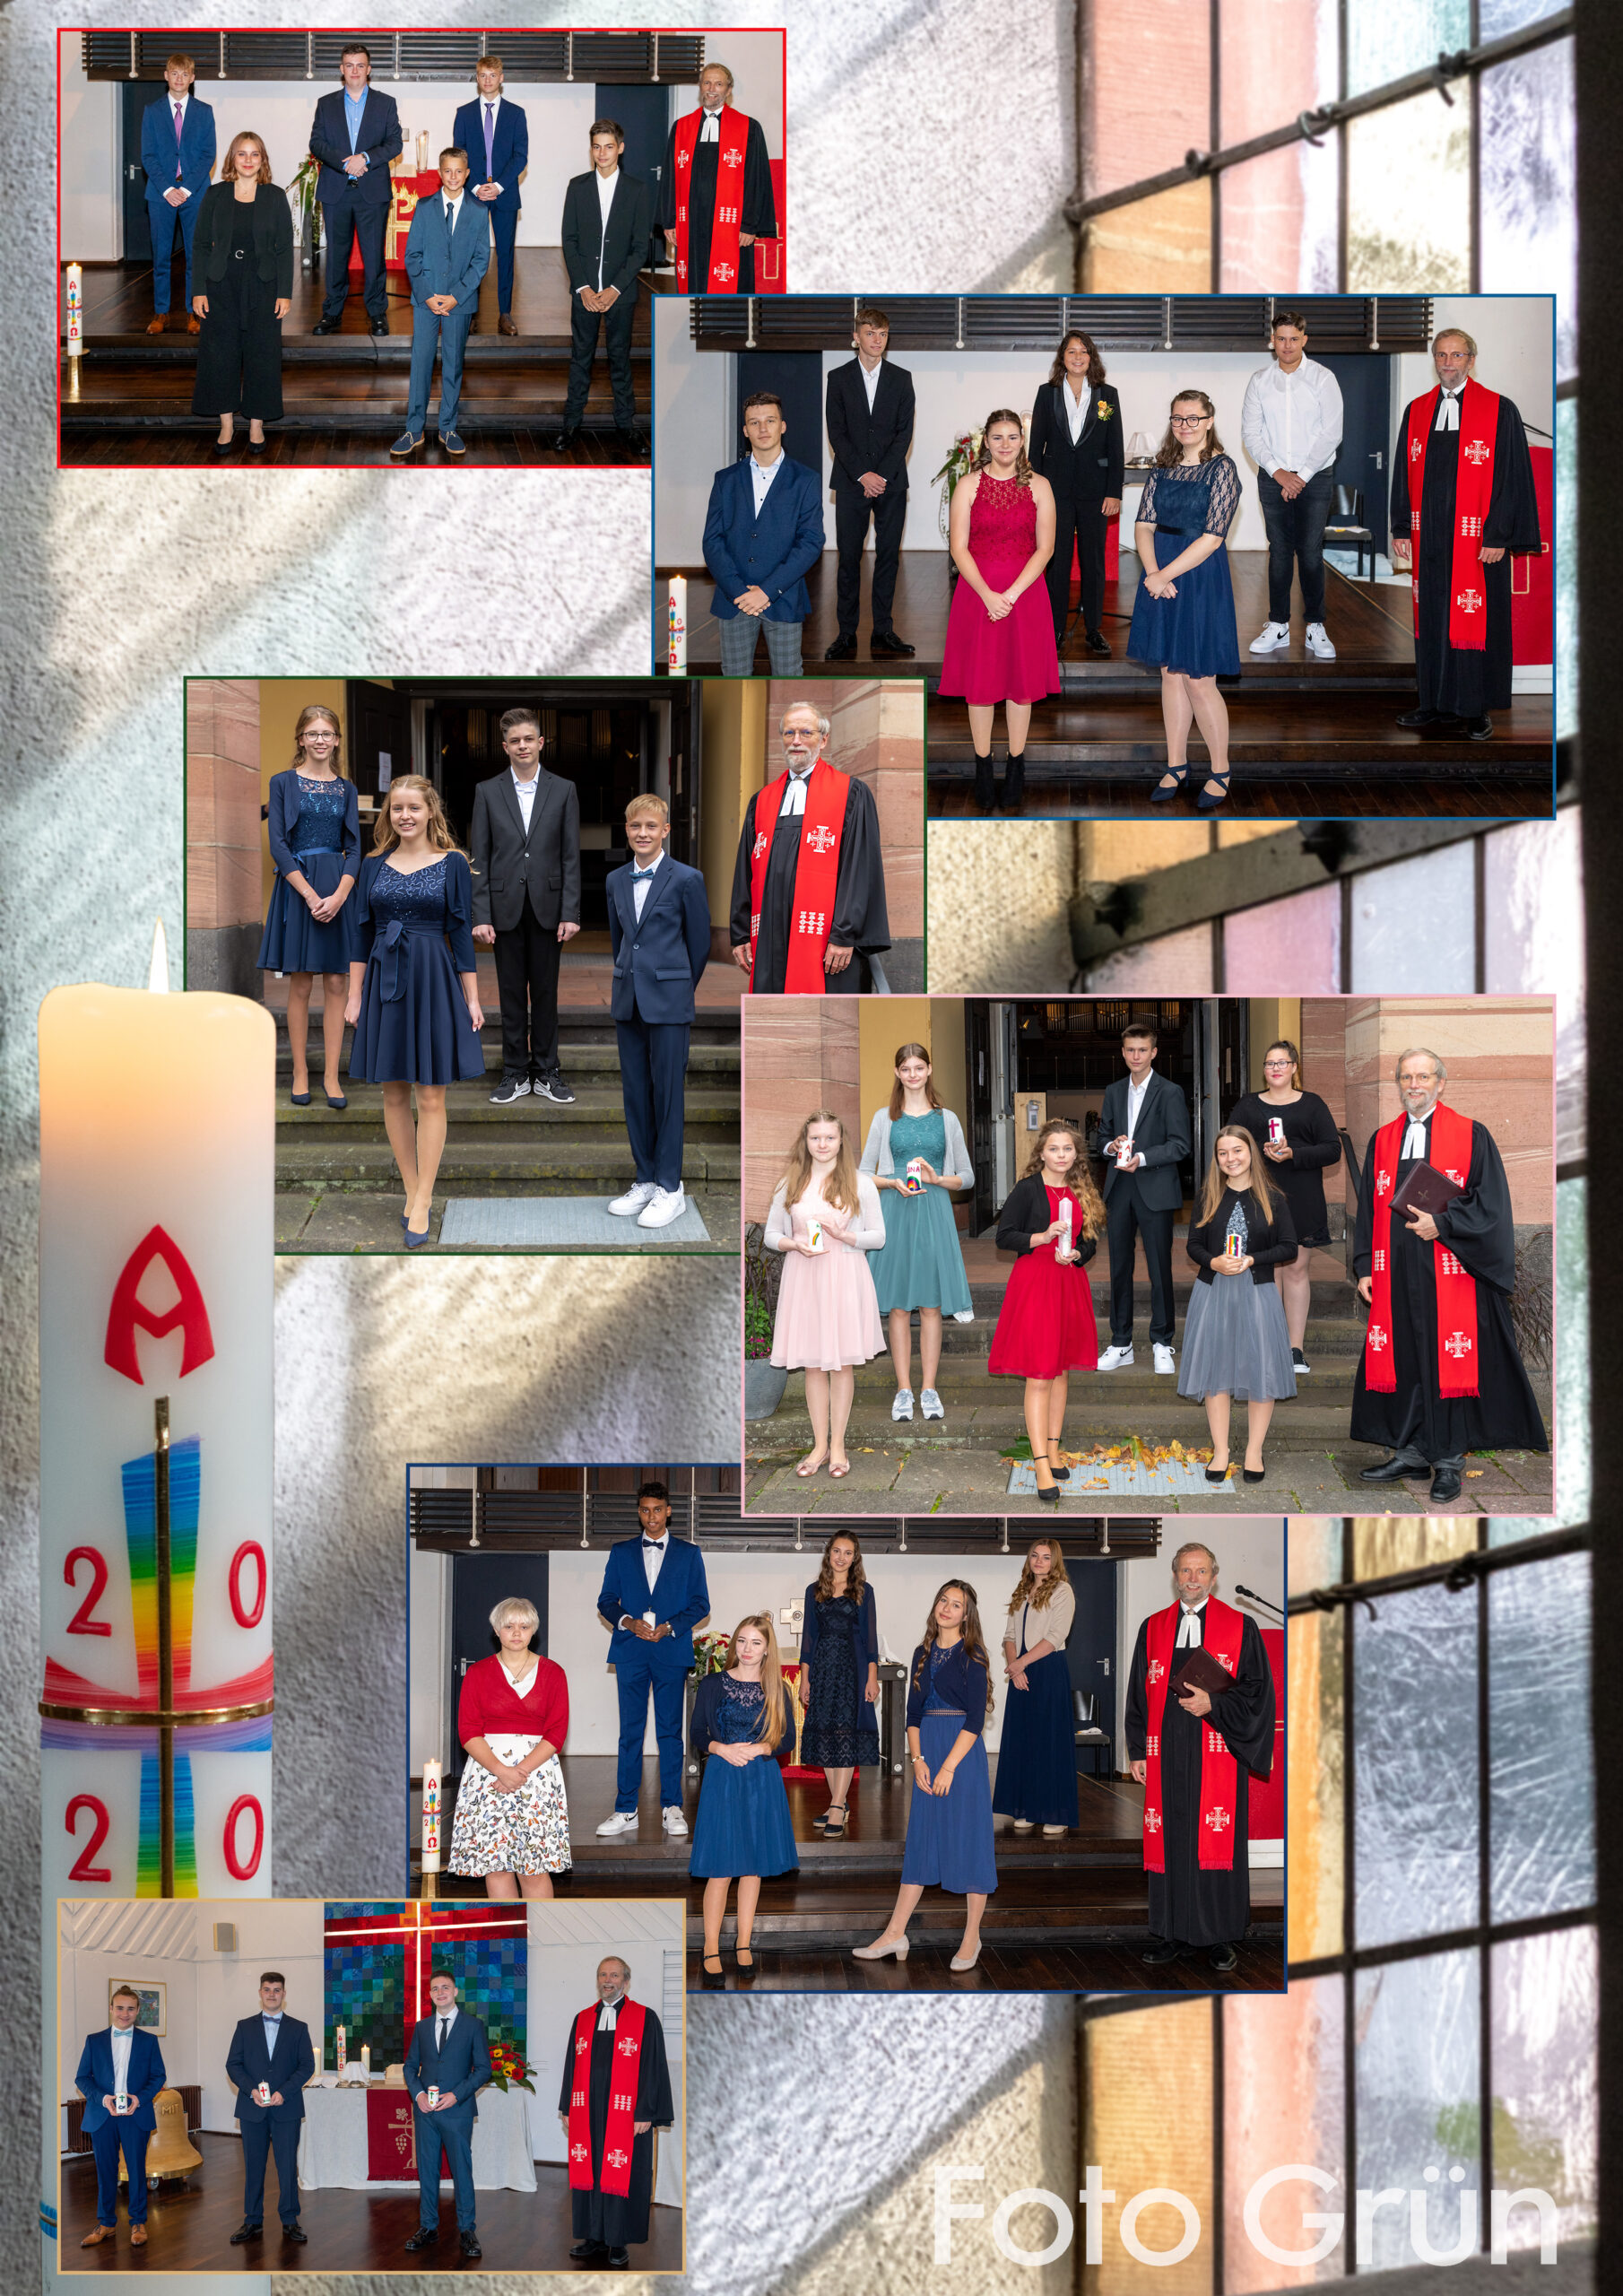 Kontakte_2020_11_Konfis_GA_2020_Collage